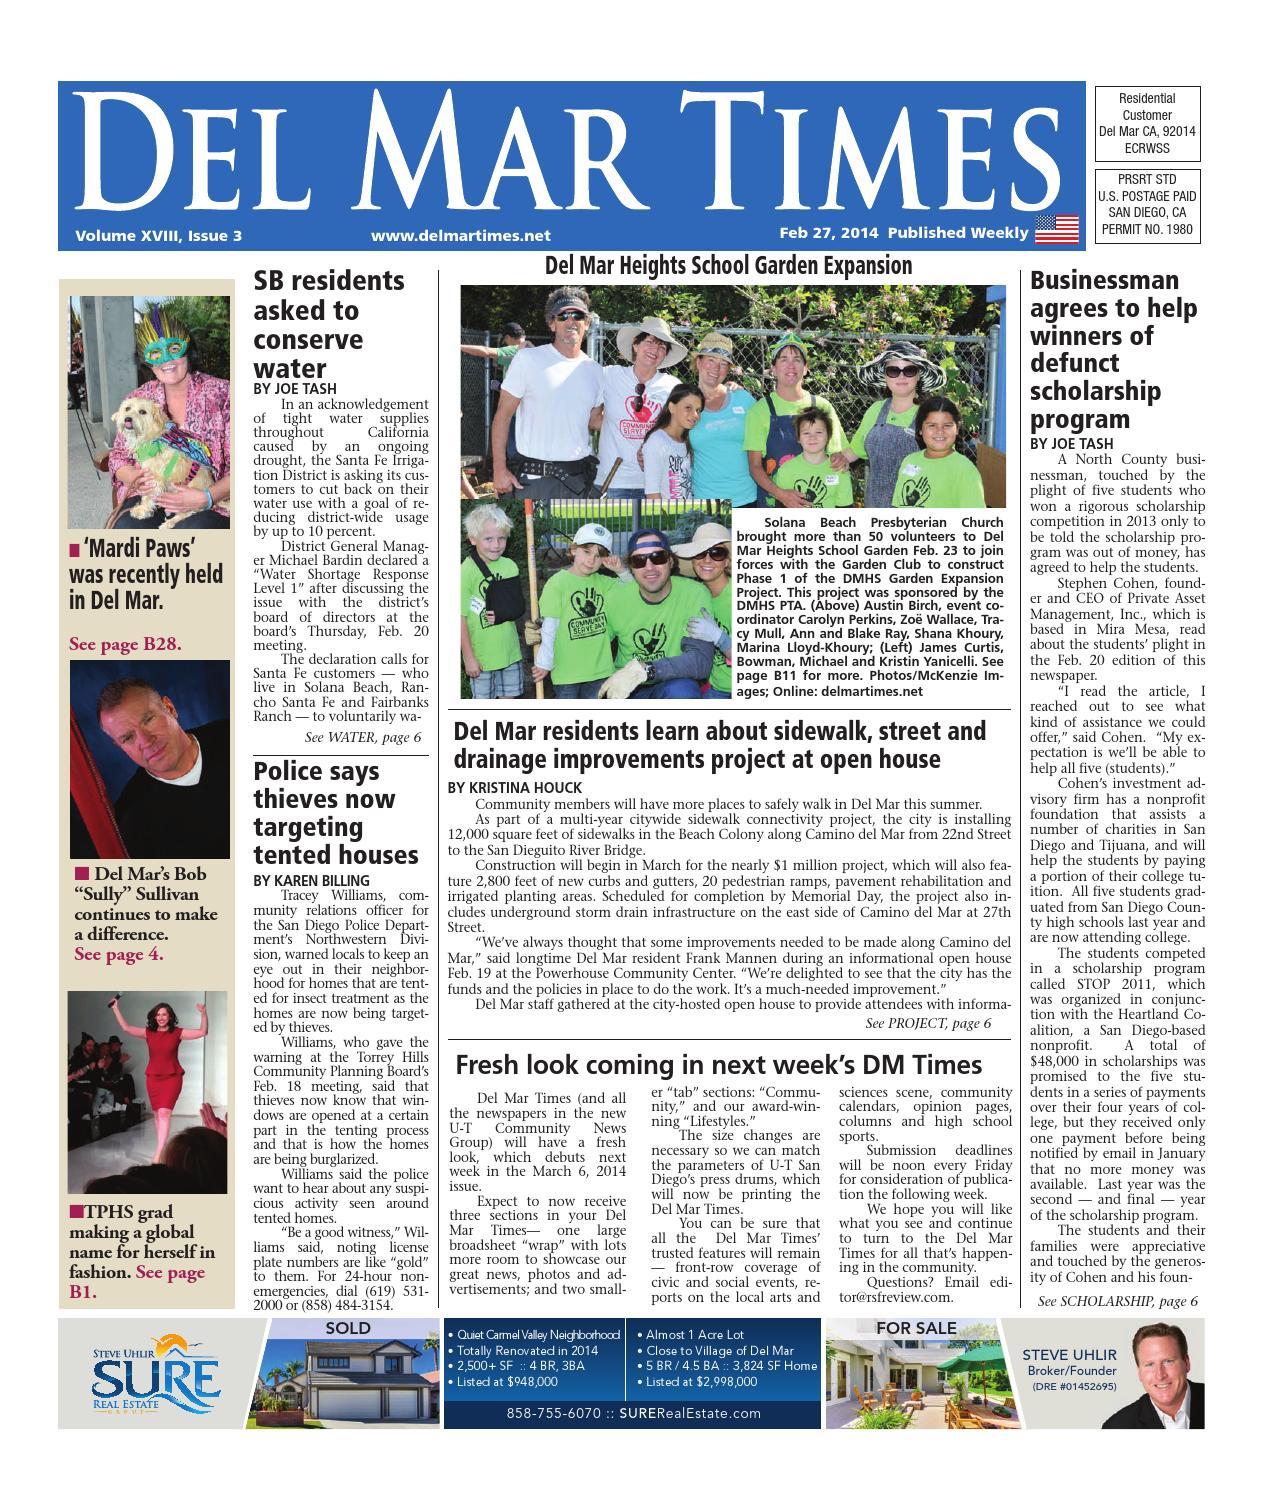 foto de Del mar times 2 27 14 by MainStreet Media - issuu